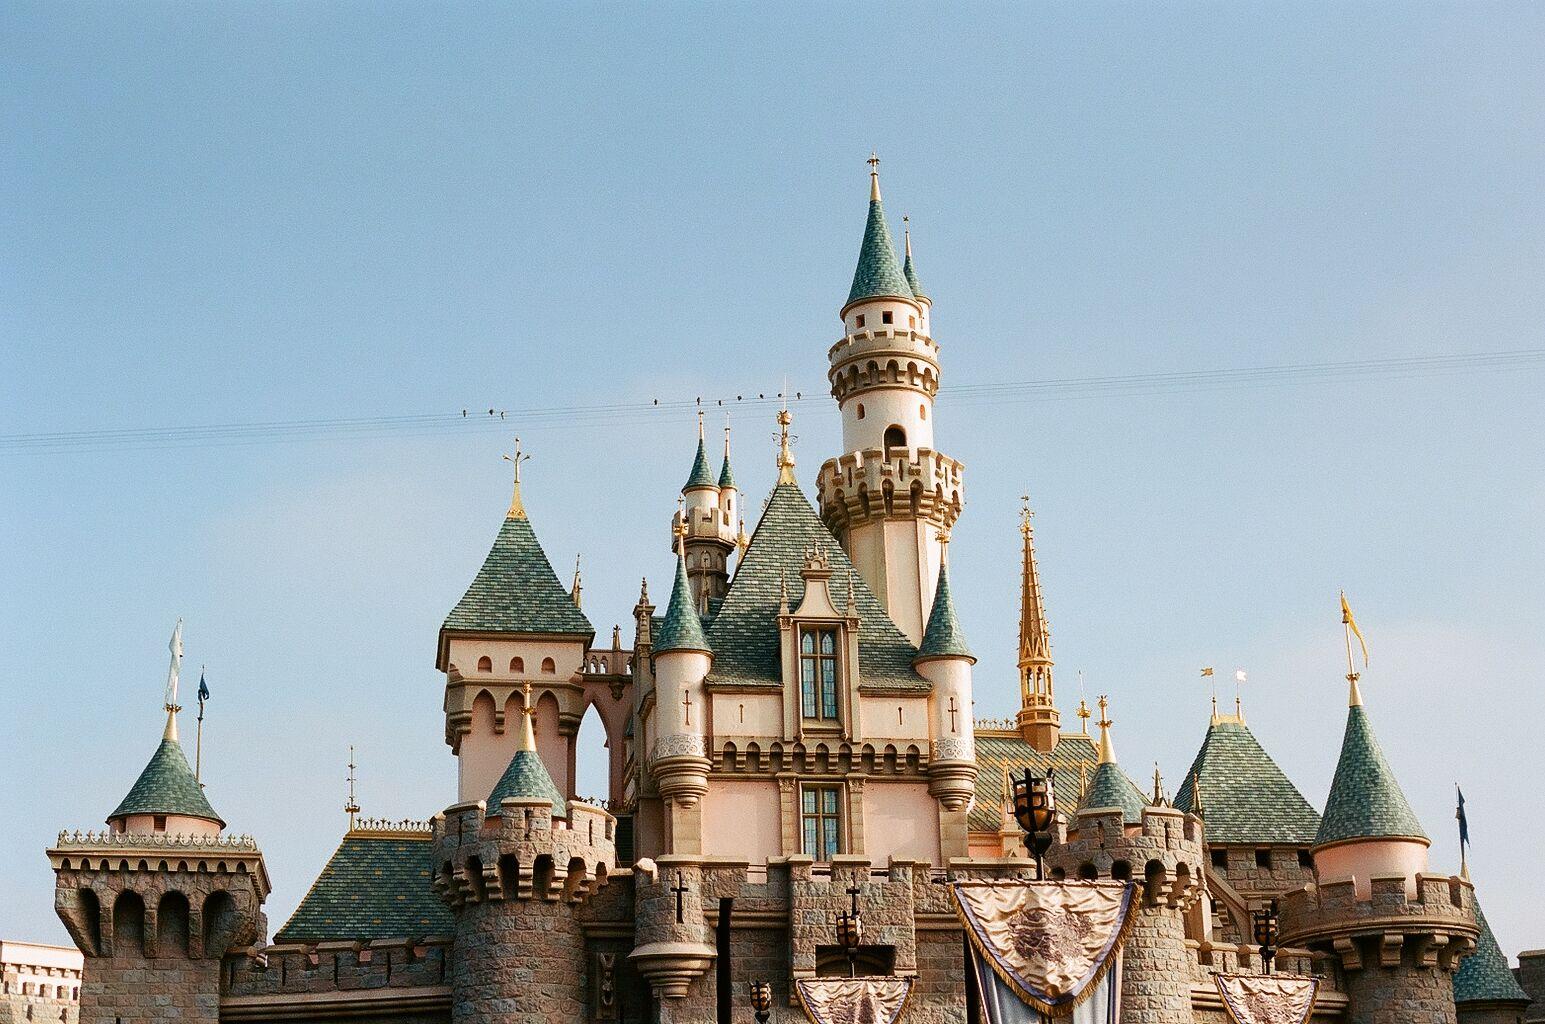 Disneyland Kodak Portra 400 35mm Film Photography | SarahMichiko.com